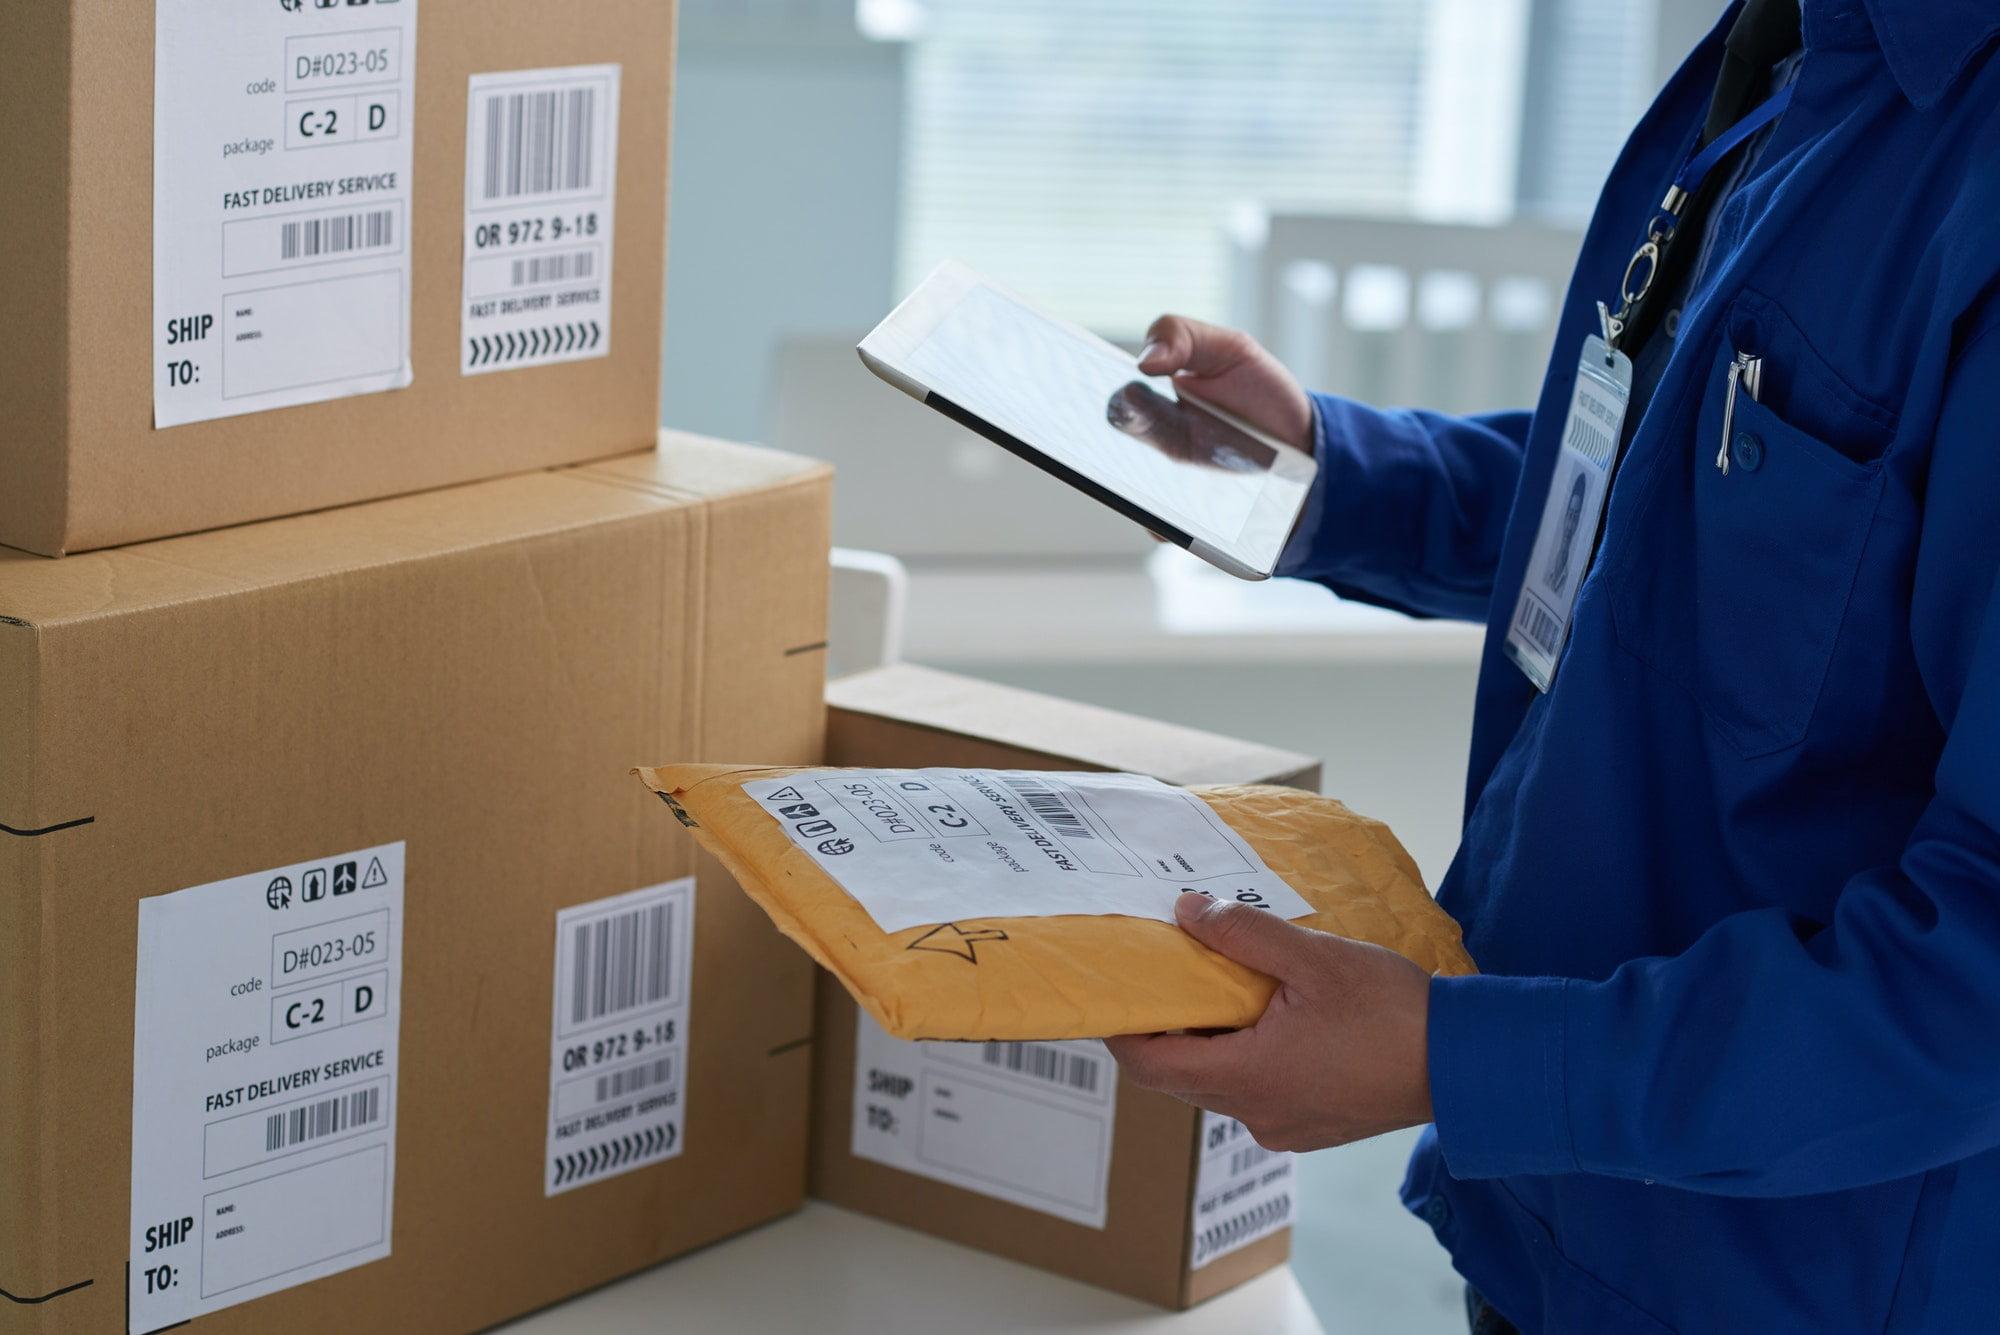 Checkig shipping info